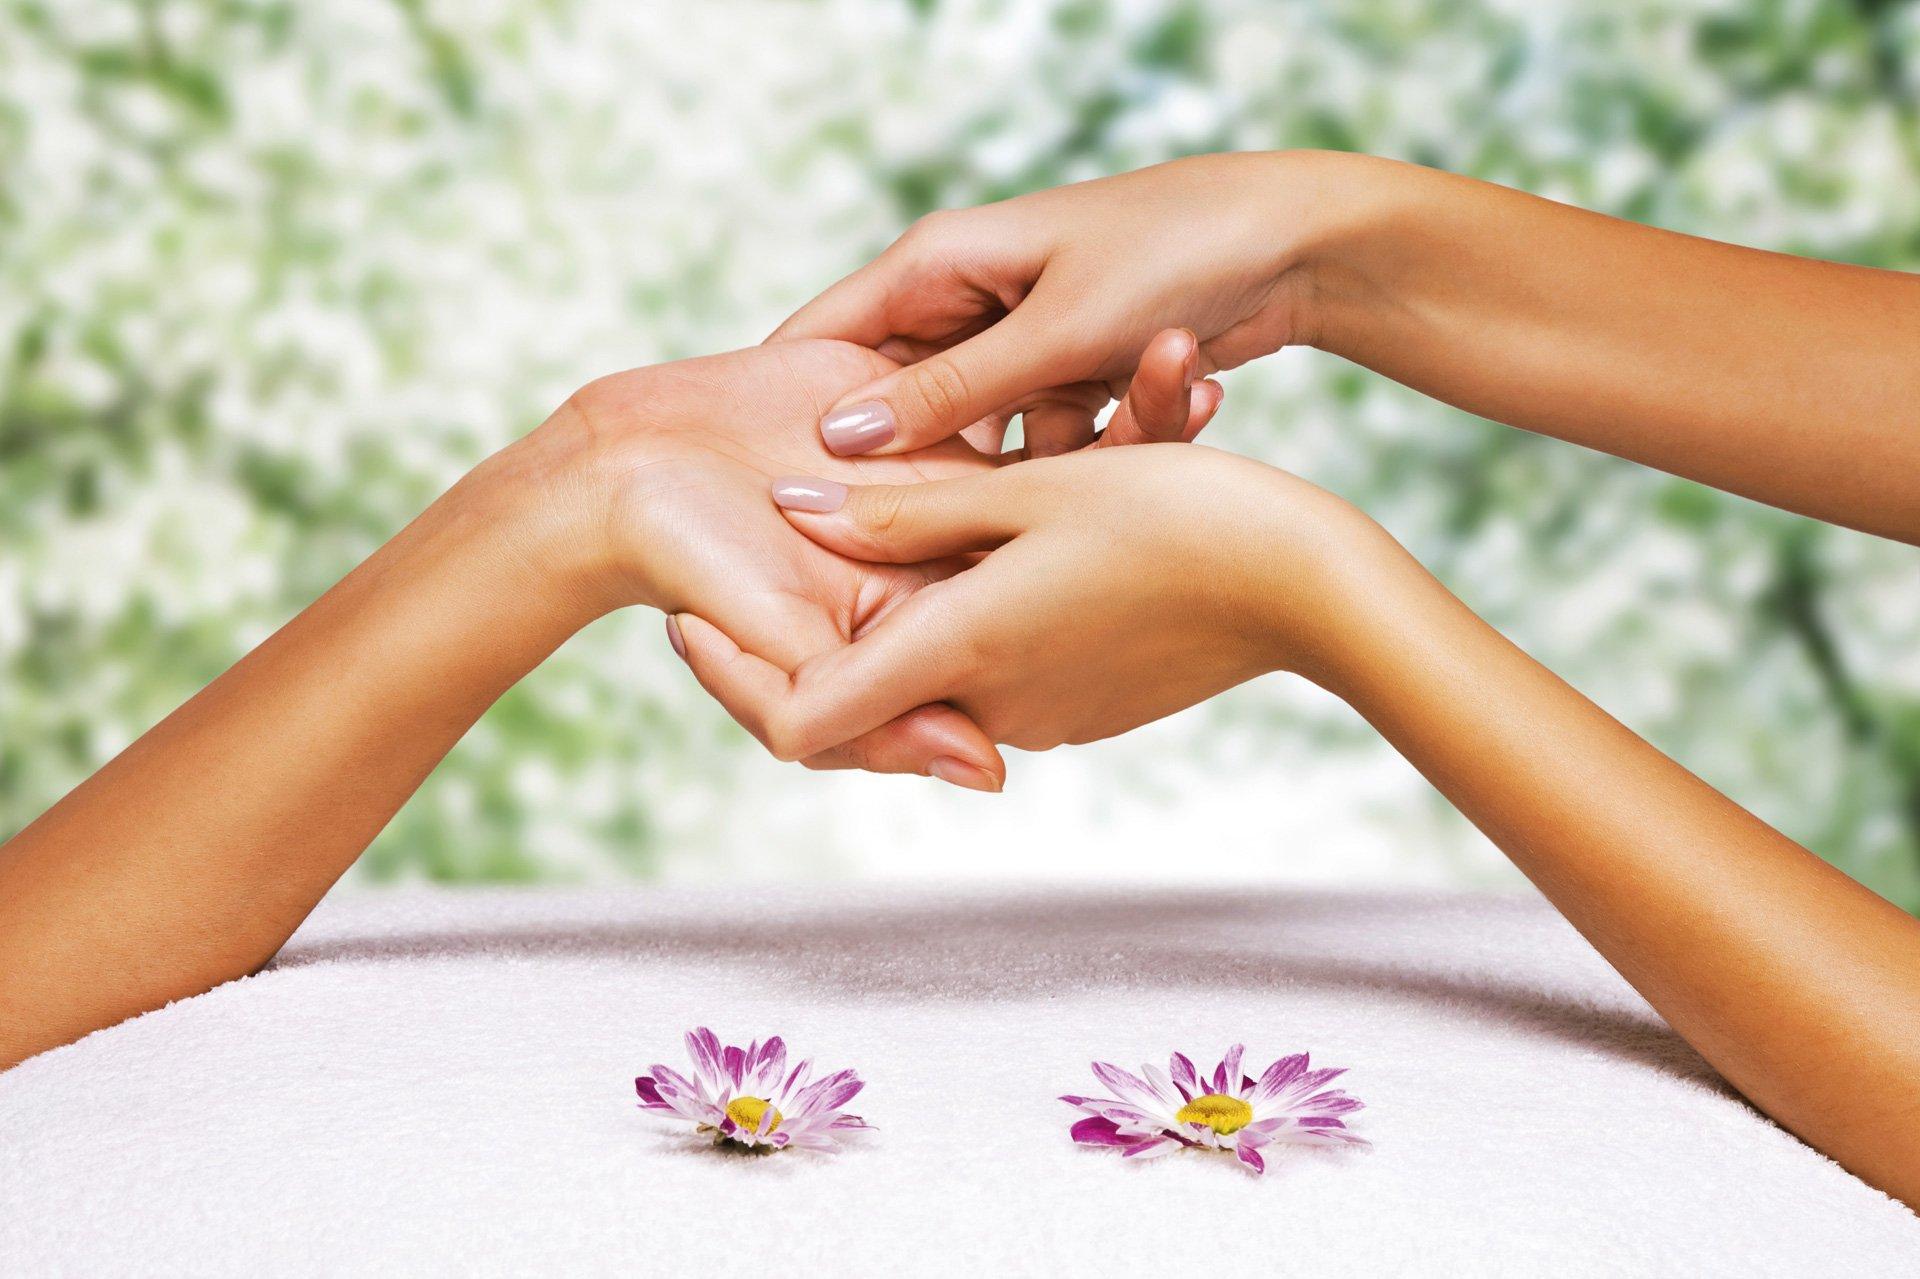 hand massage using essential oils